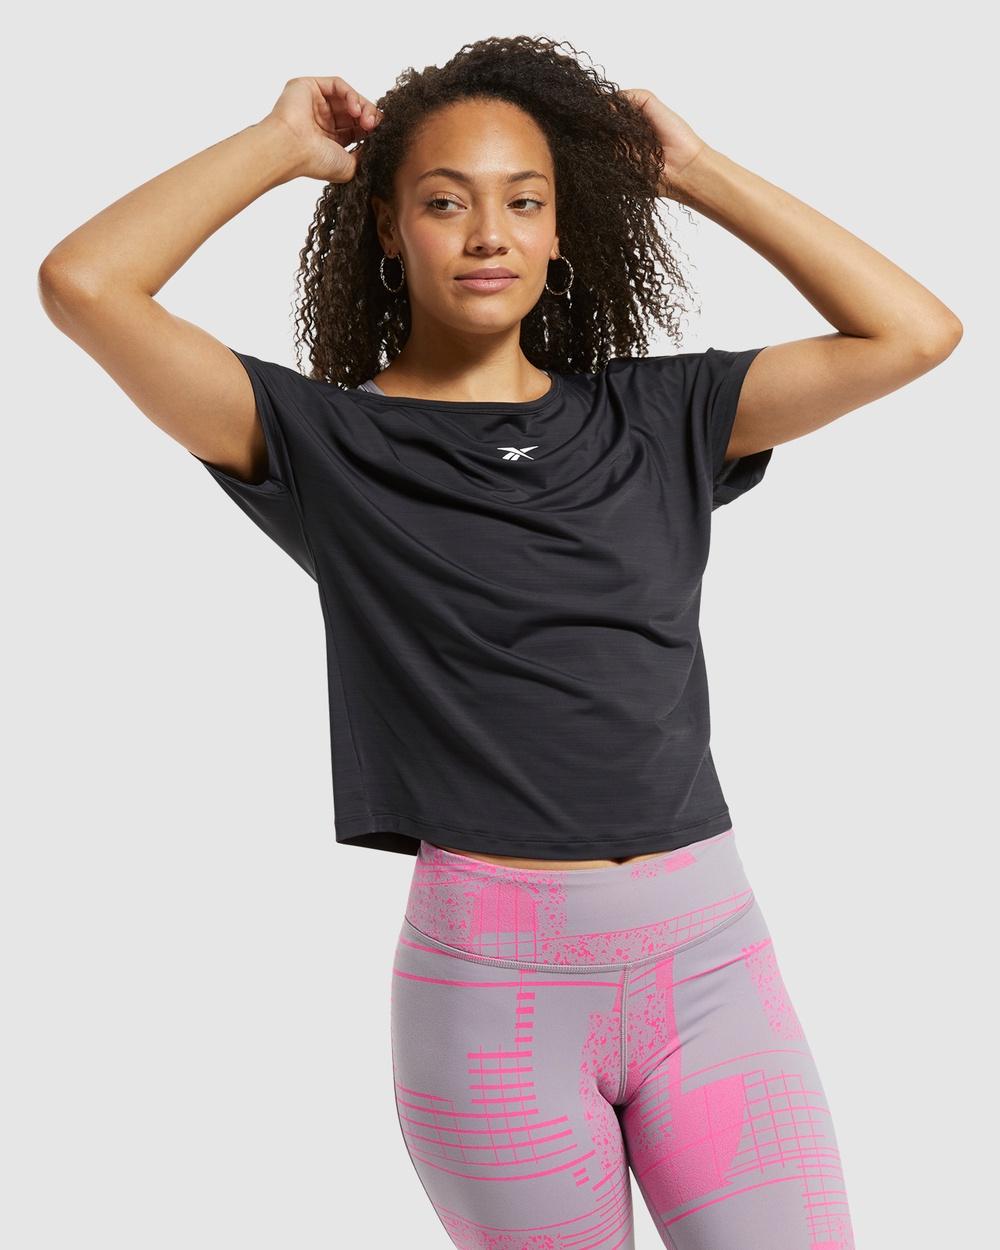 Reebok Performance - ACTIVCHILL Boxy Tee - Long Sleeve T-Shirts (Black) ACTIVCHILL Boxy Tee